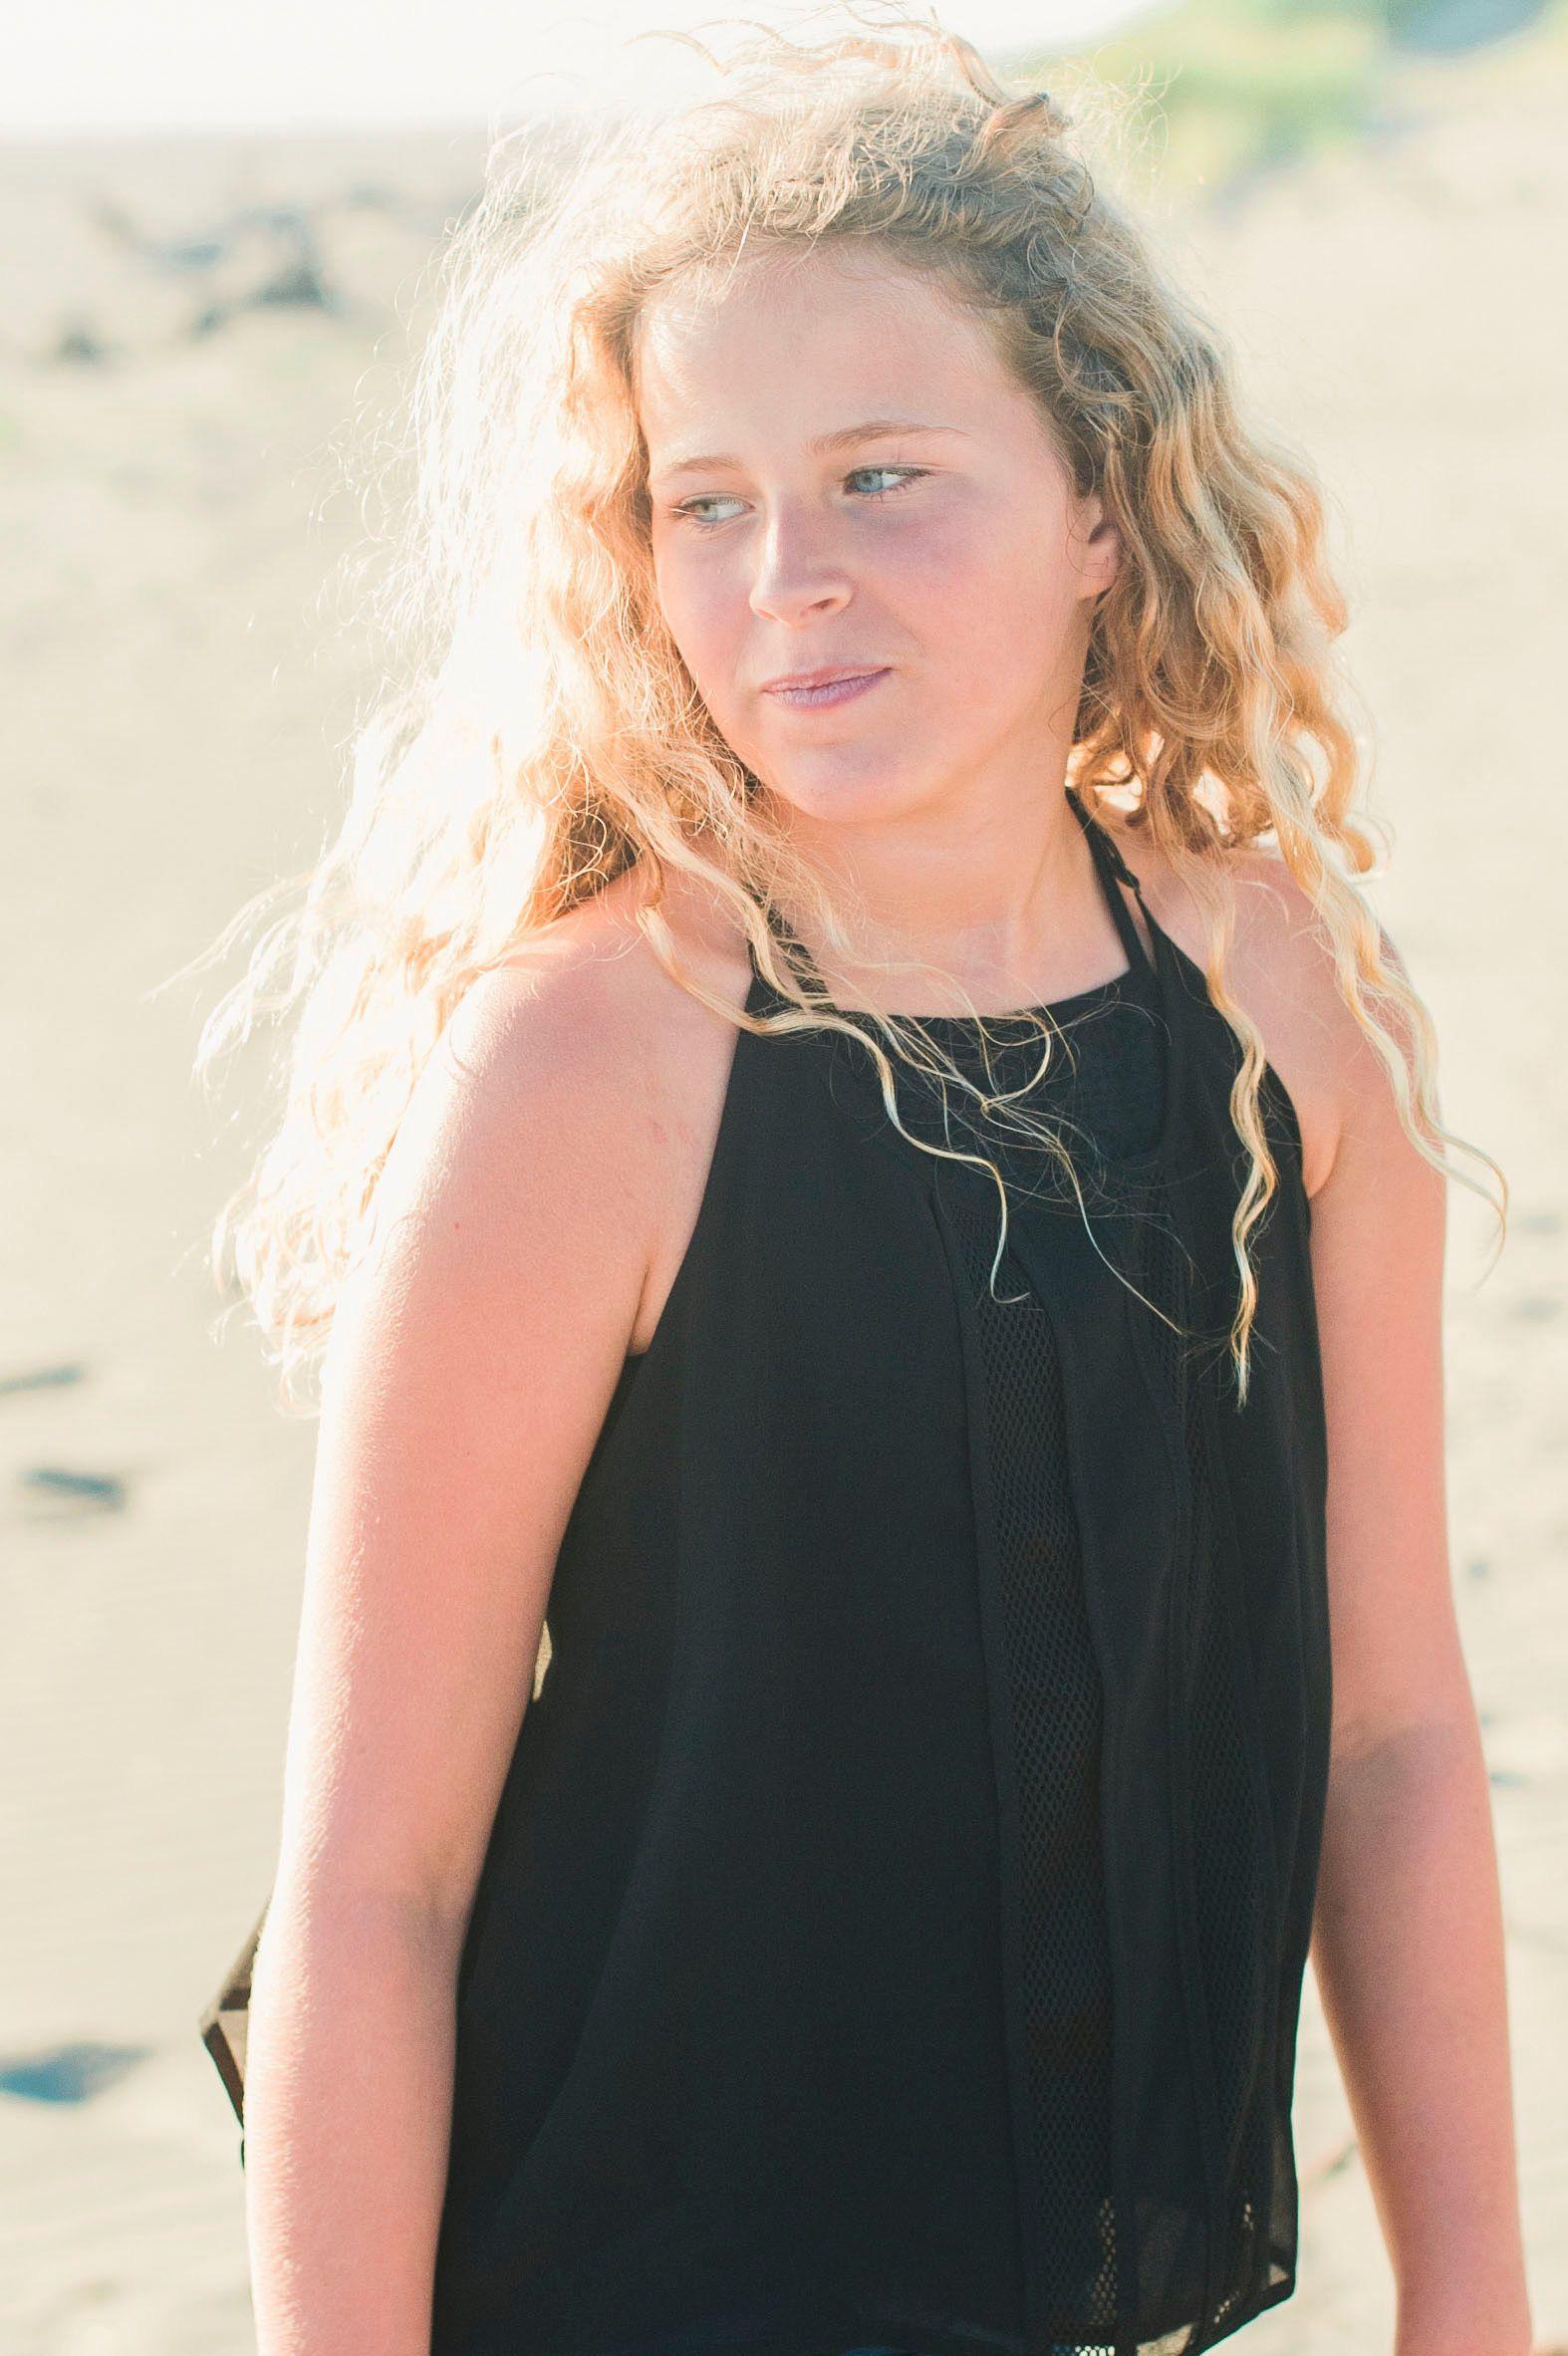 edac854b41003 Astoria Oregon, Ella Moss, More Photos, Children Photography, Clarks,  Youth, Website, Tank Tops, Beach